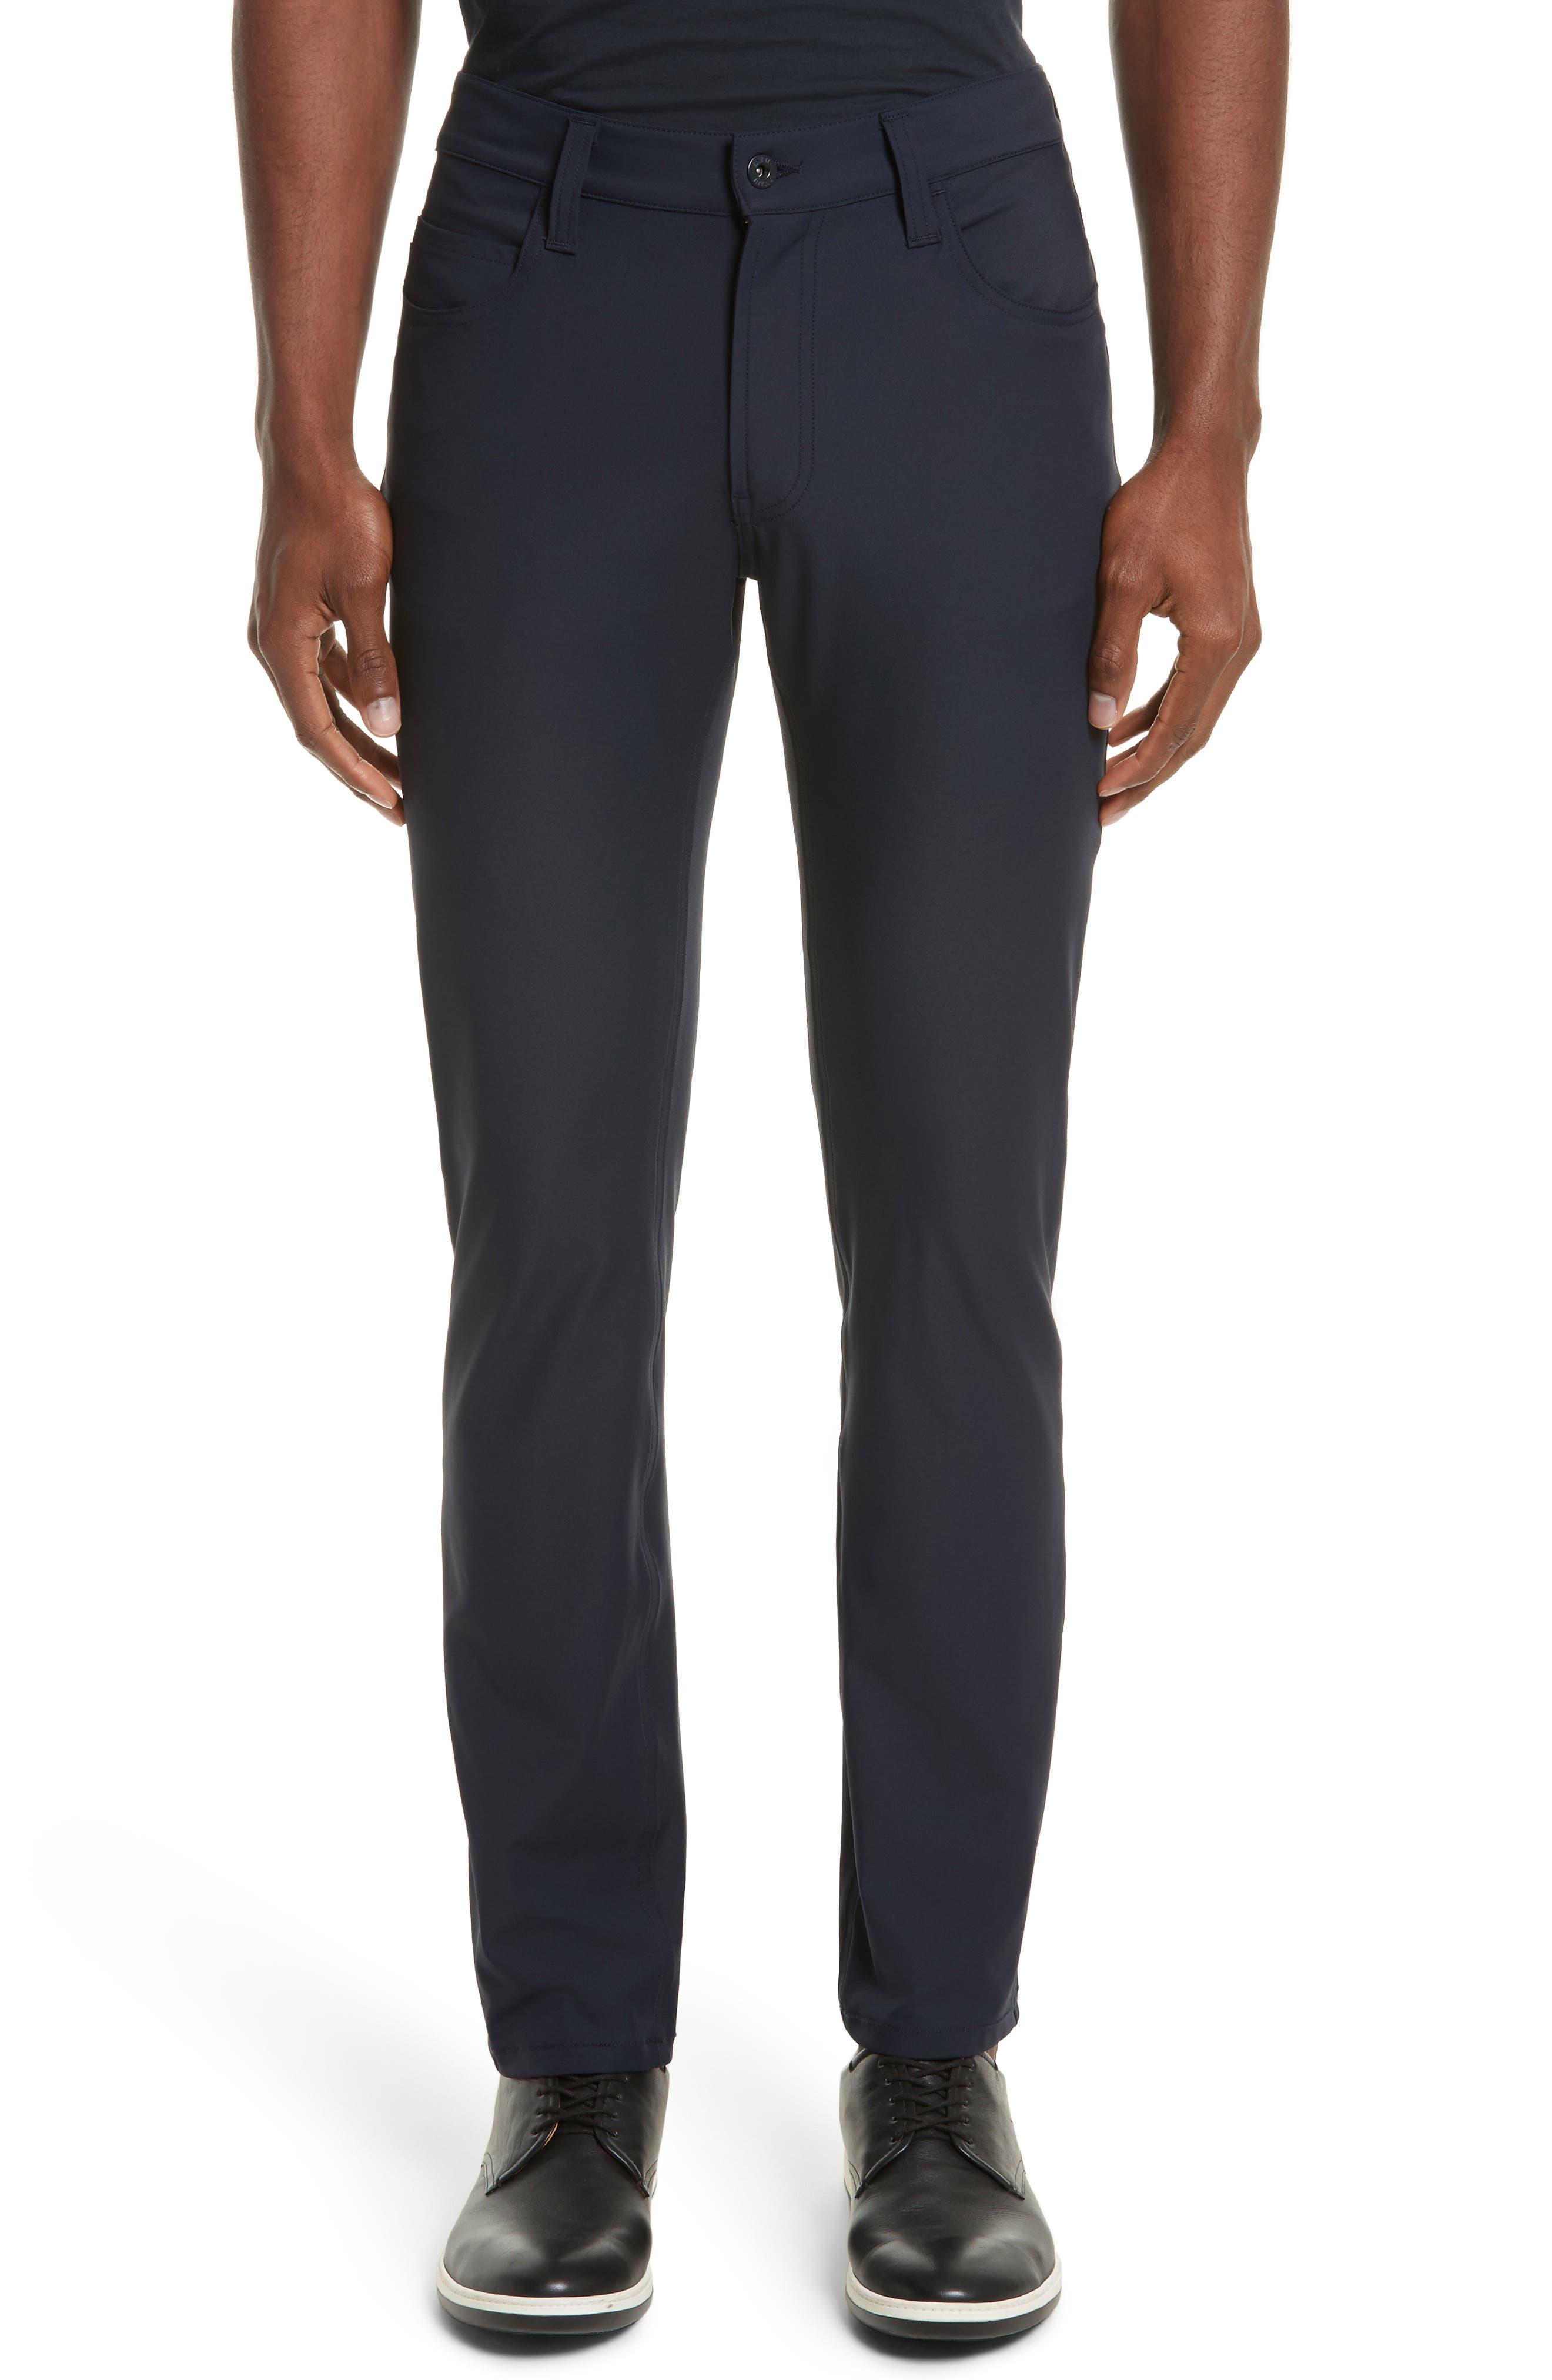 Emporio Armani AJ Straight Leg Five-Pocket Pants